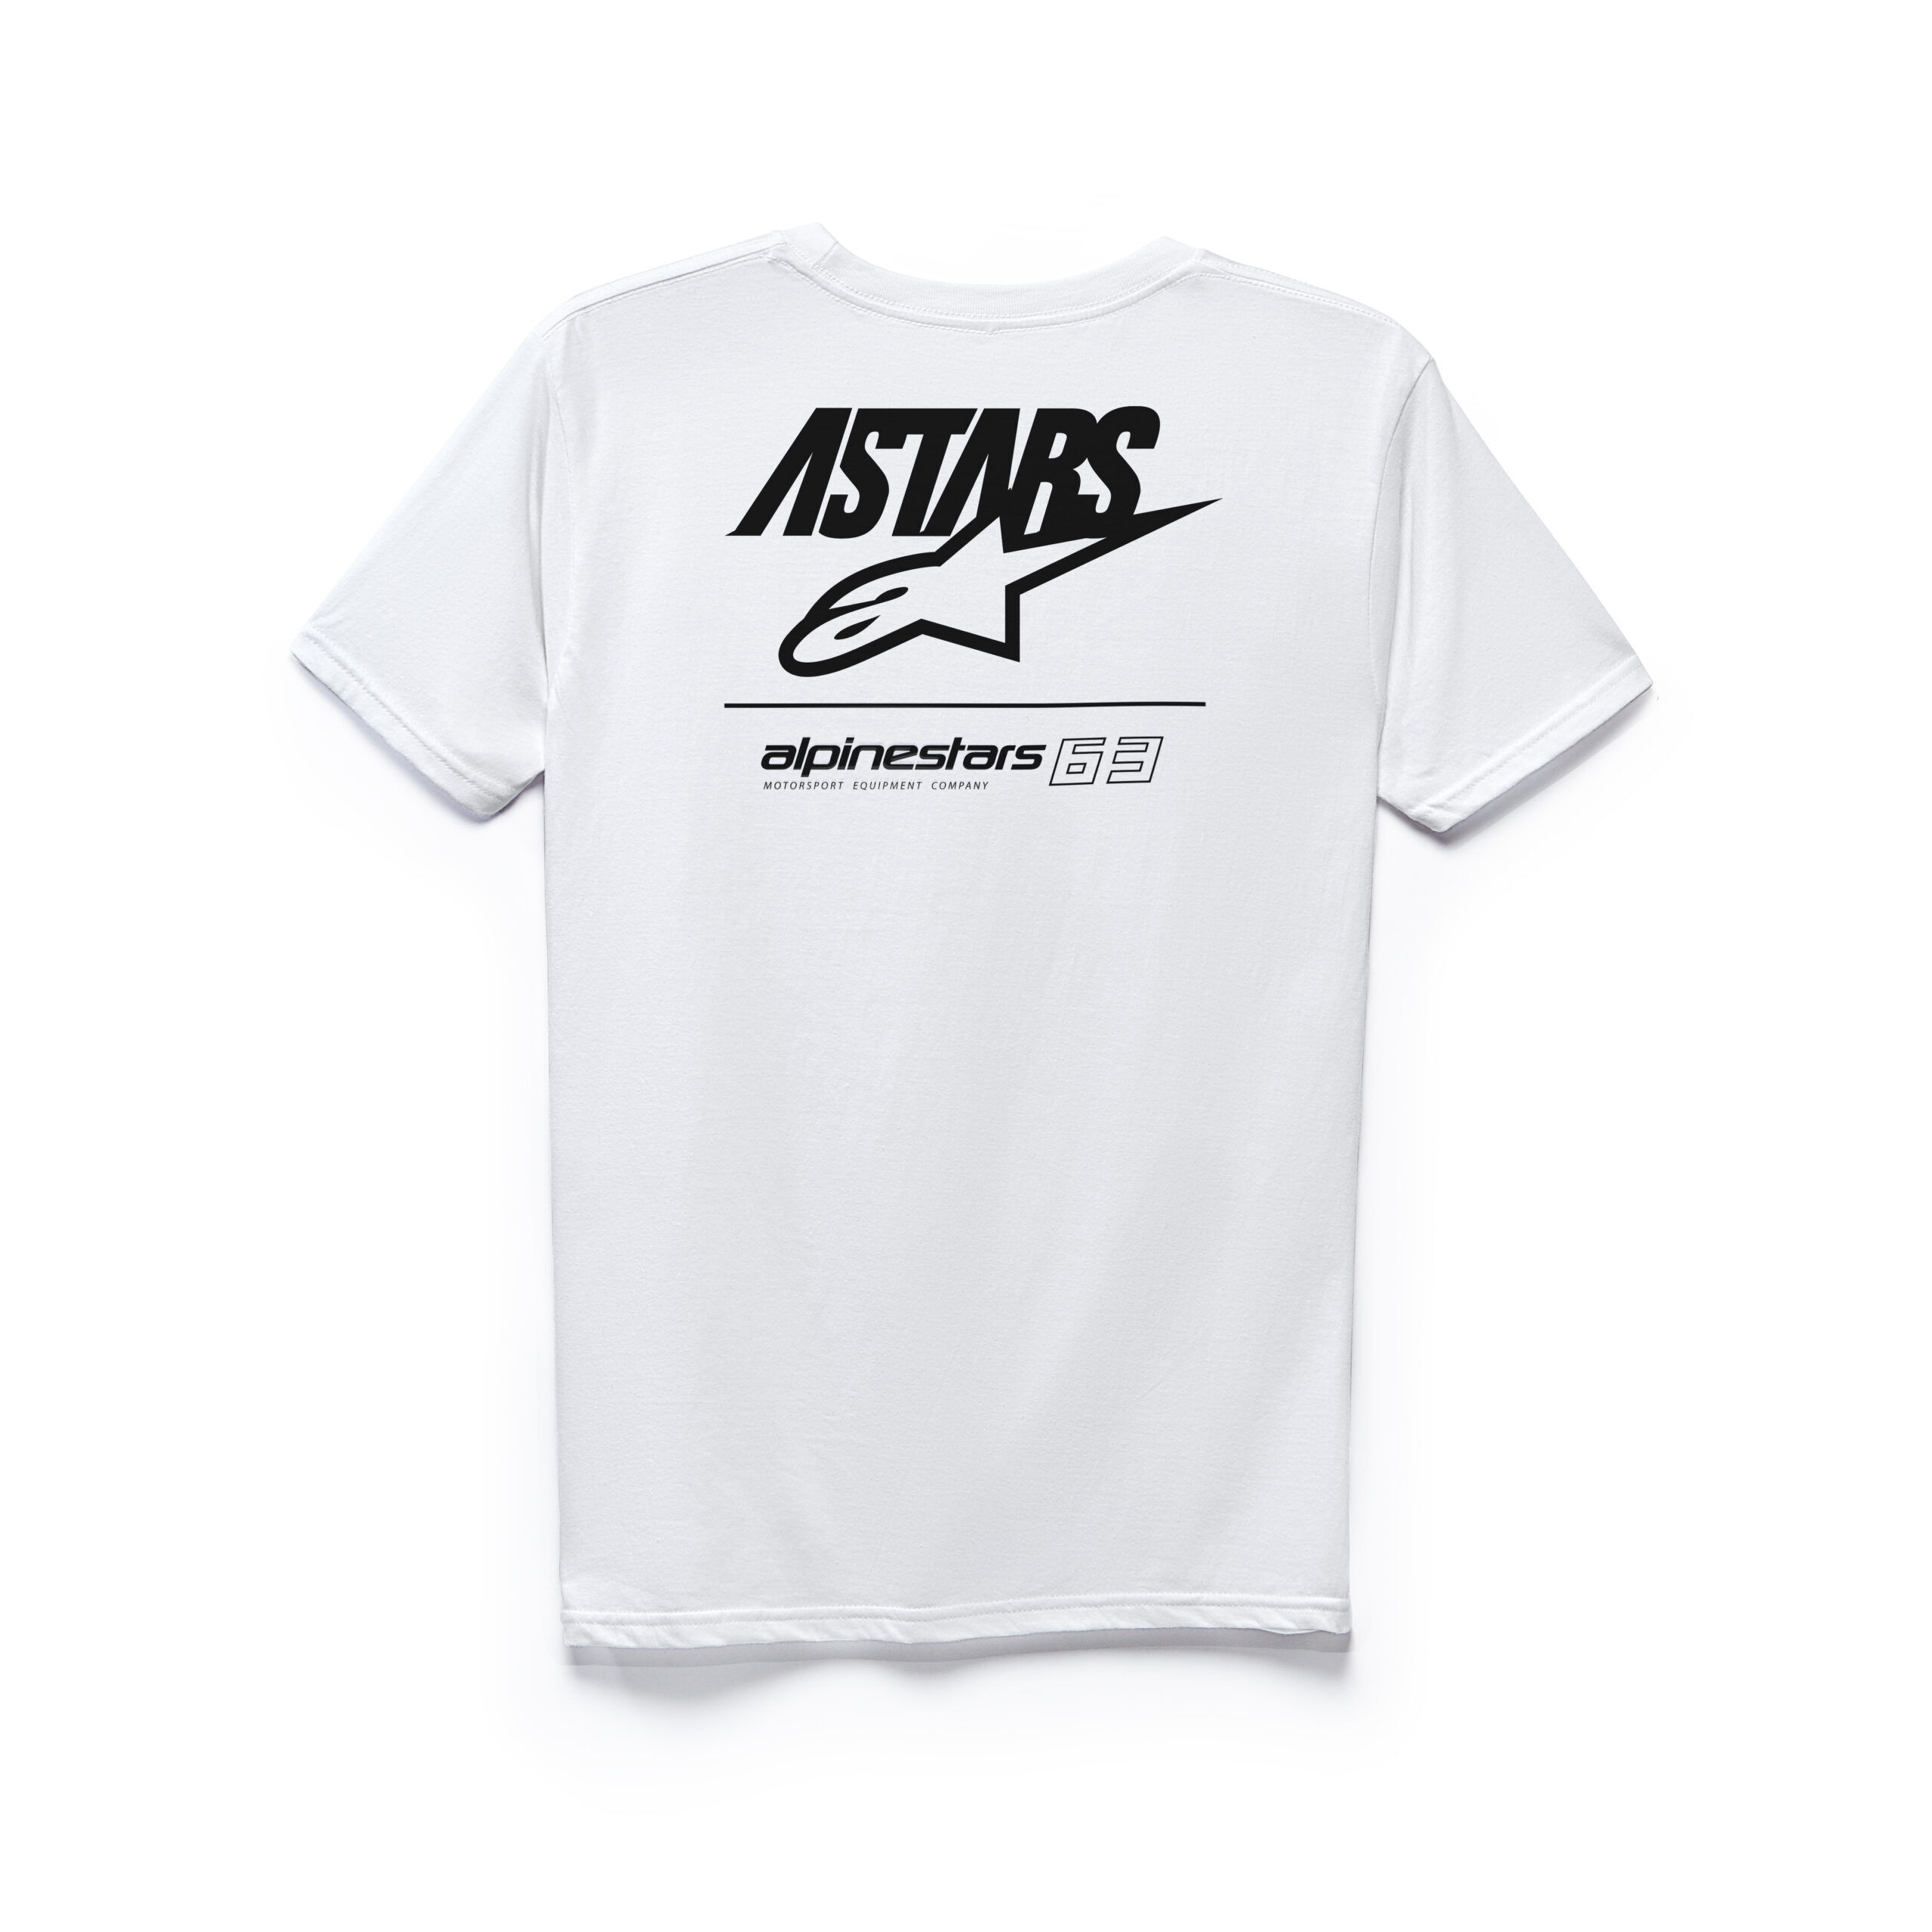 Alpinestars Astars 63 Tee - witte mannen T-shirt